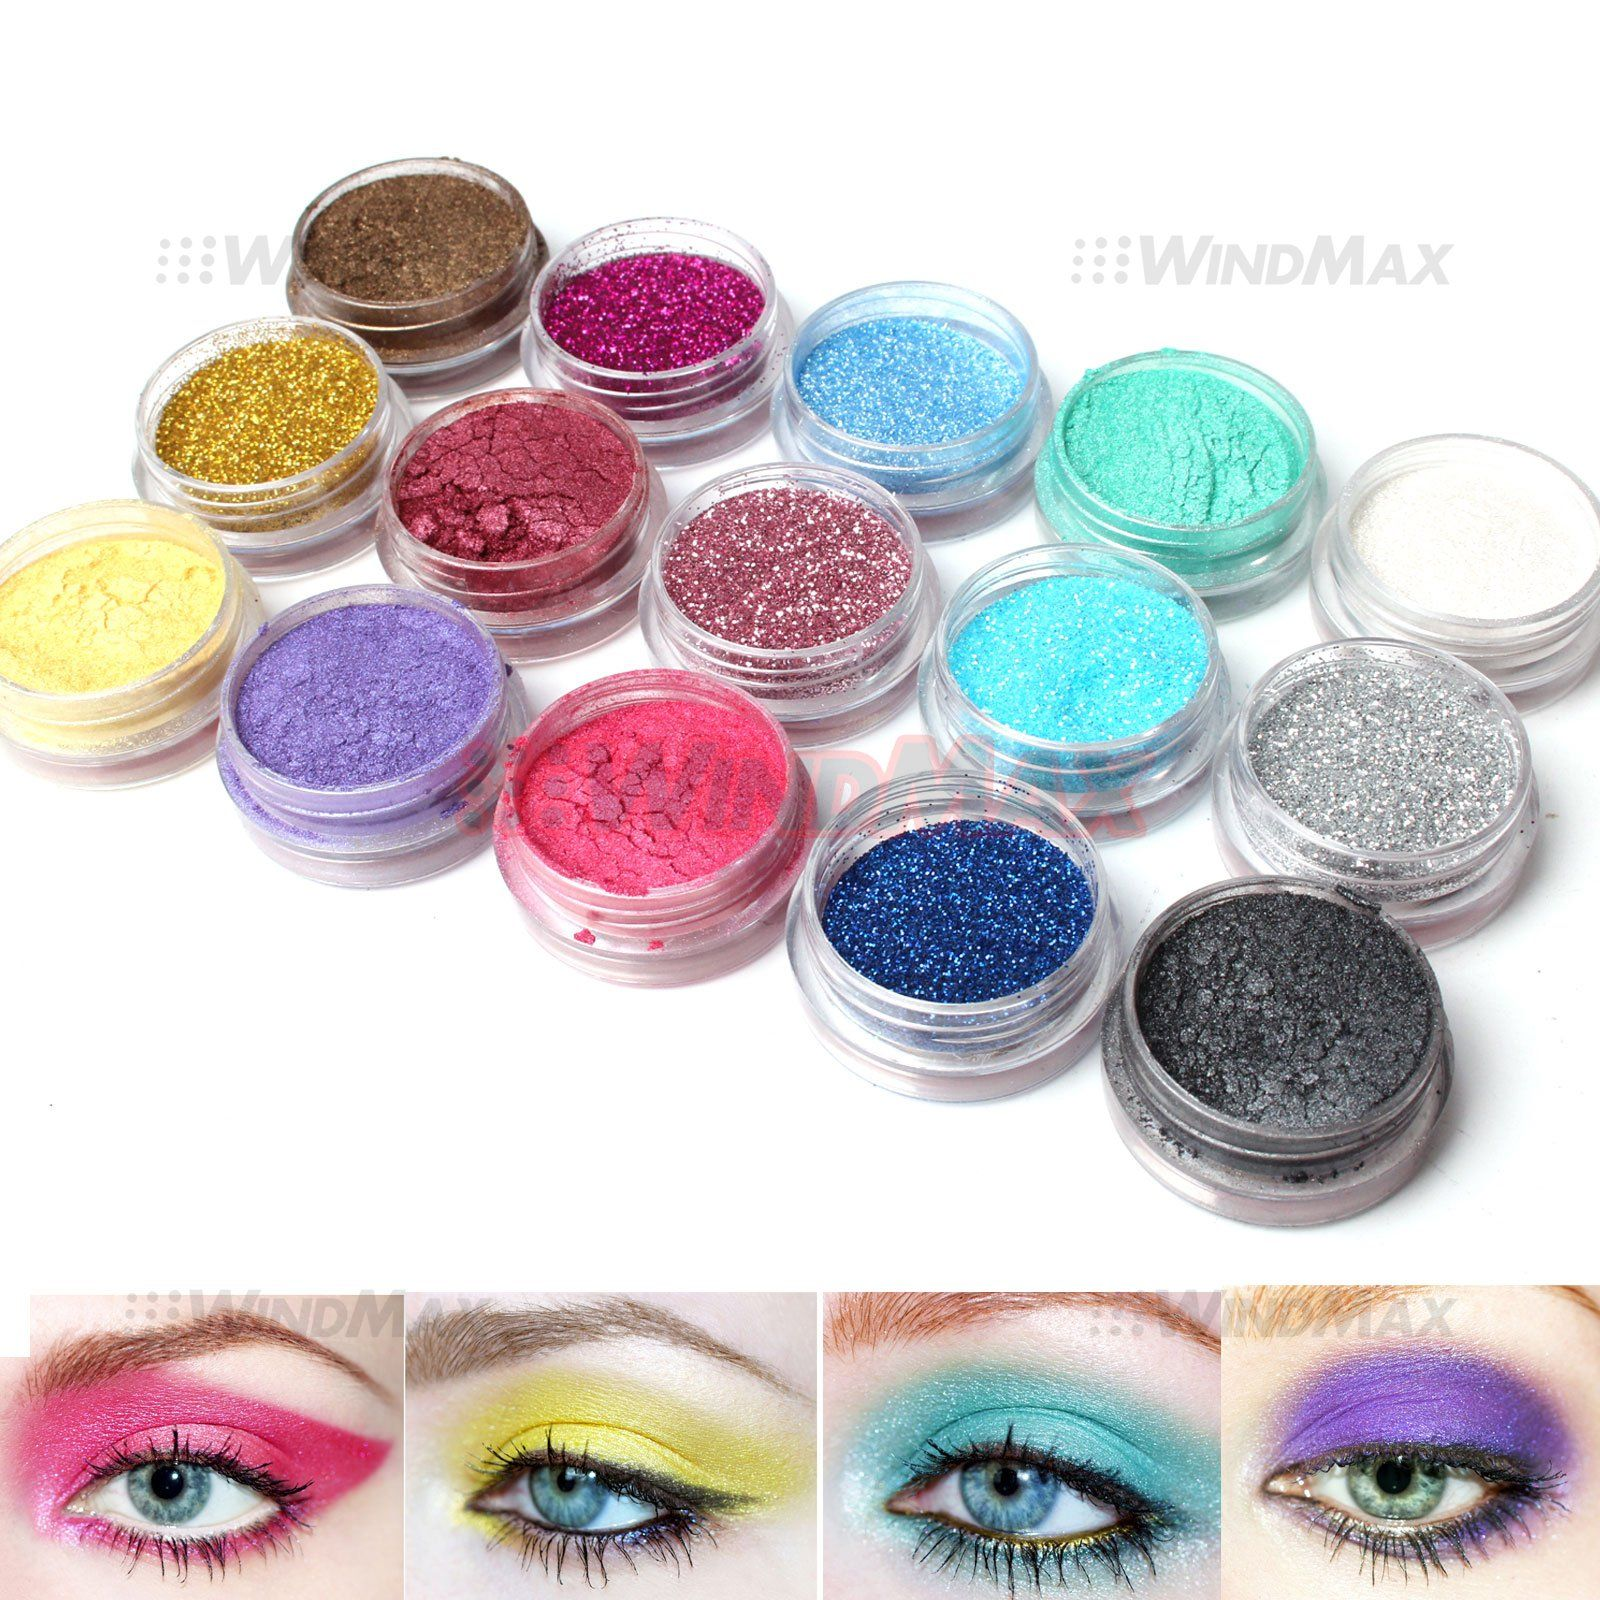 15 Warm Color Glitter Shimmer Pearl Loose Eyeshadow